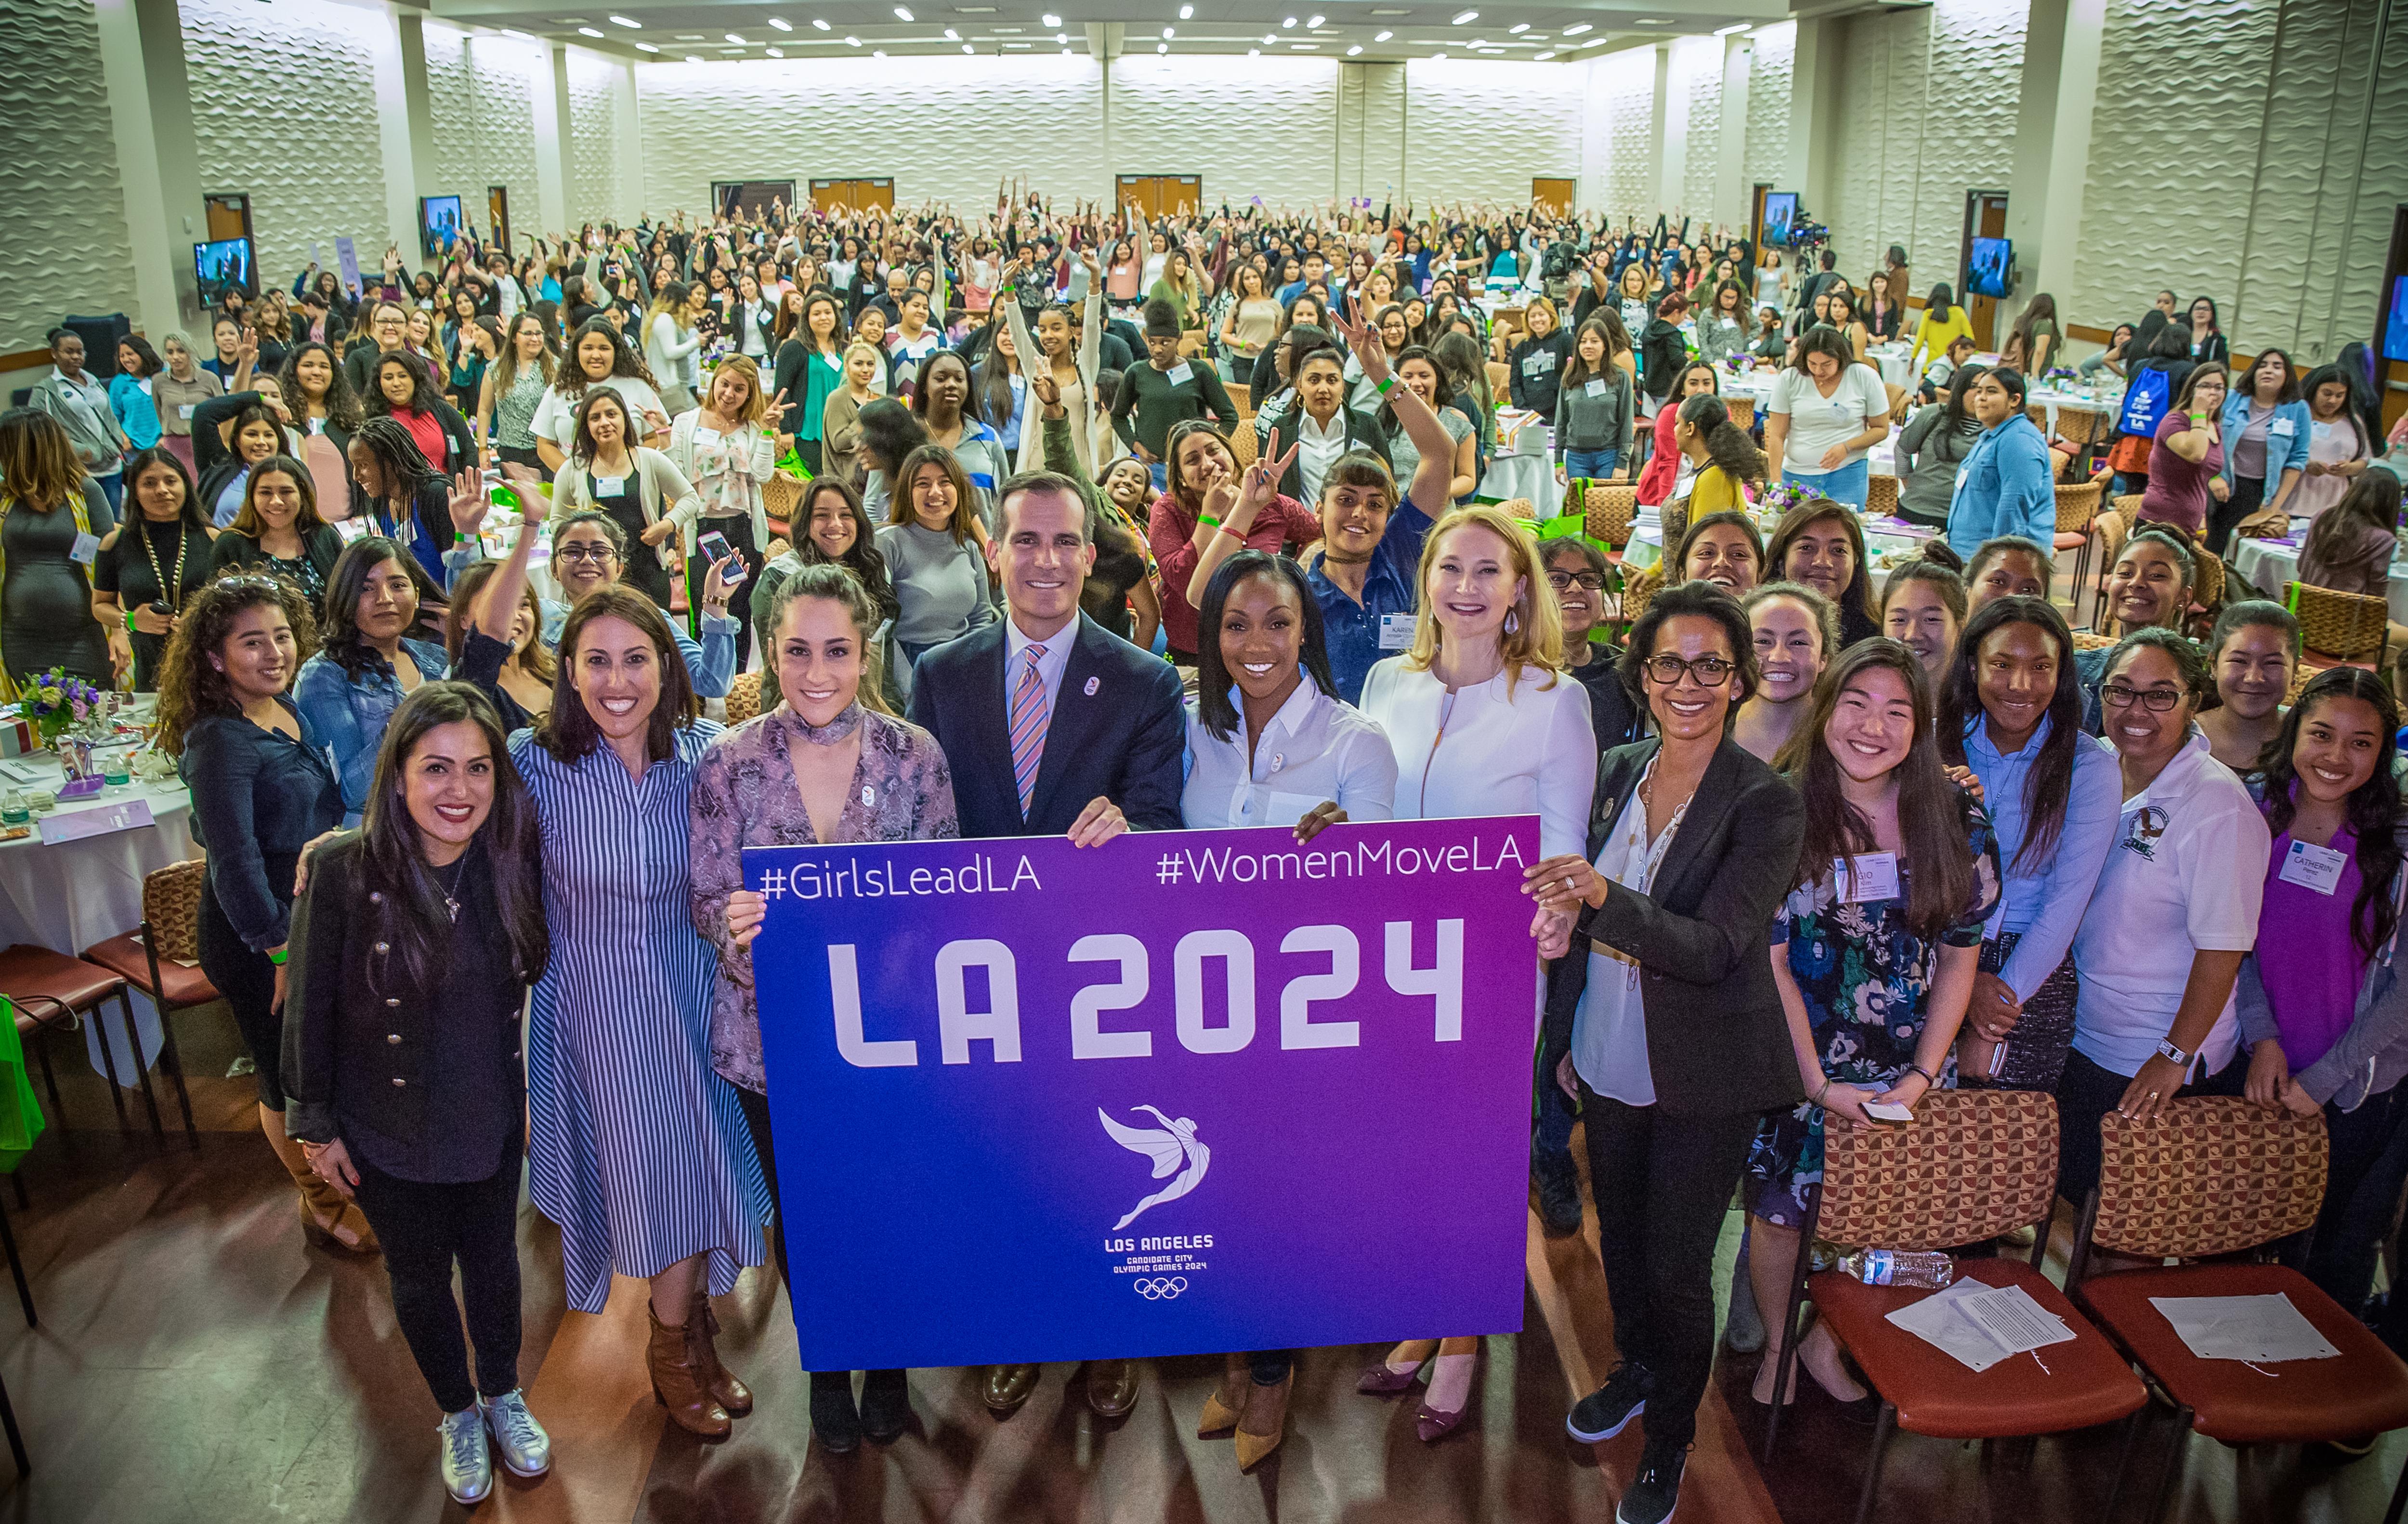 LA 2024 Olympic and Paralympic Bid Process - LA 2024 Community Engagement